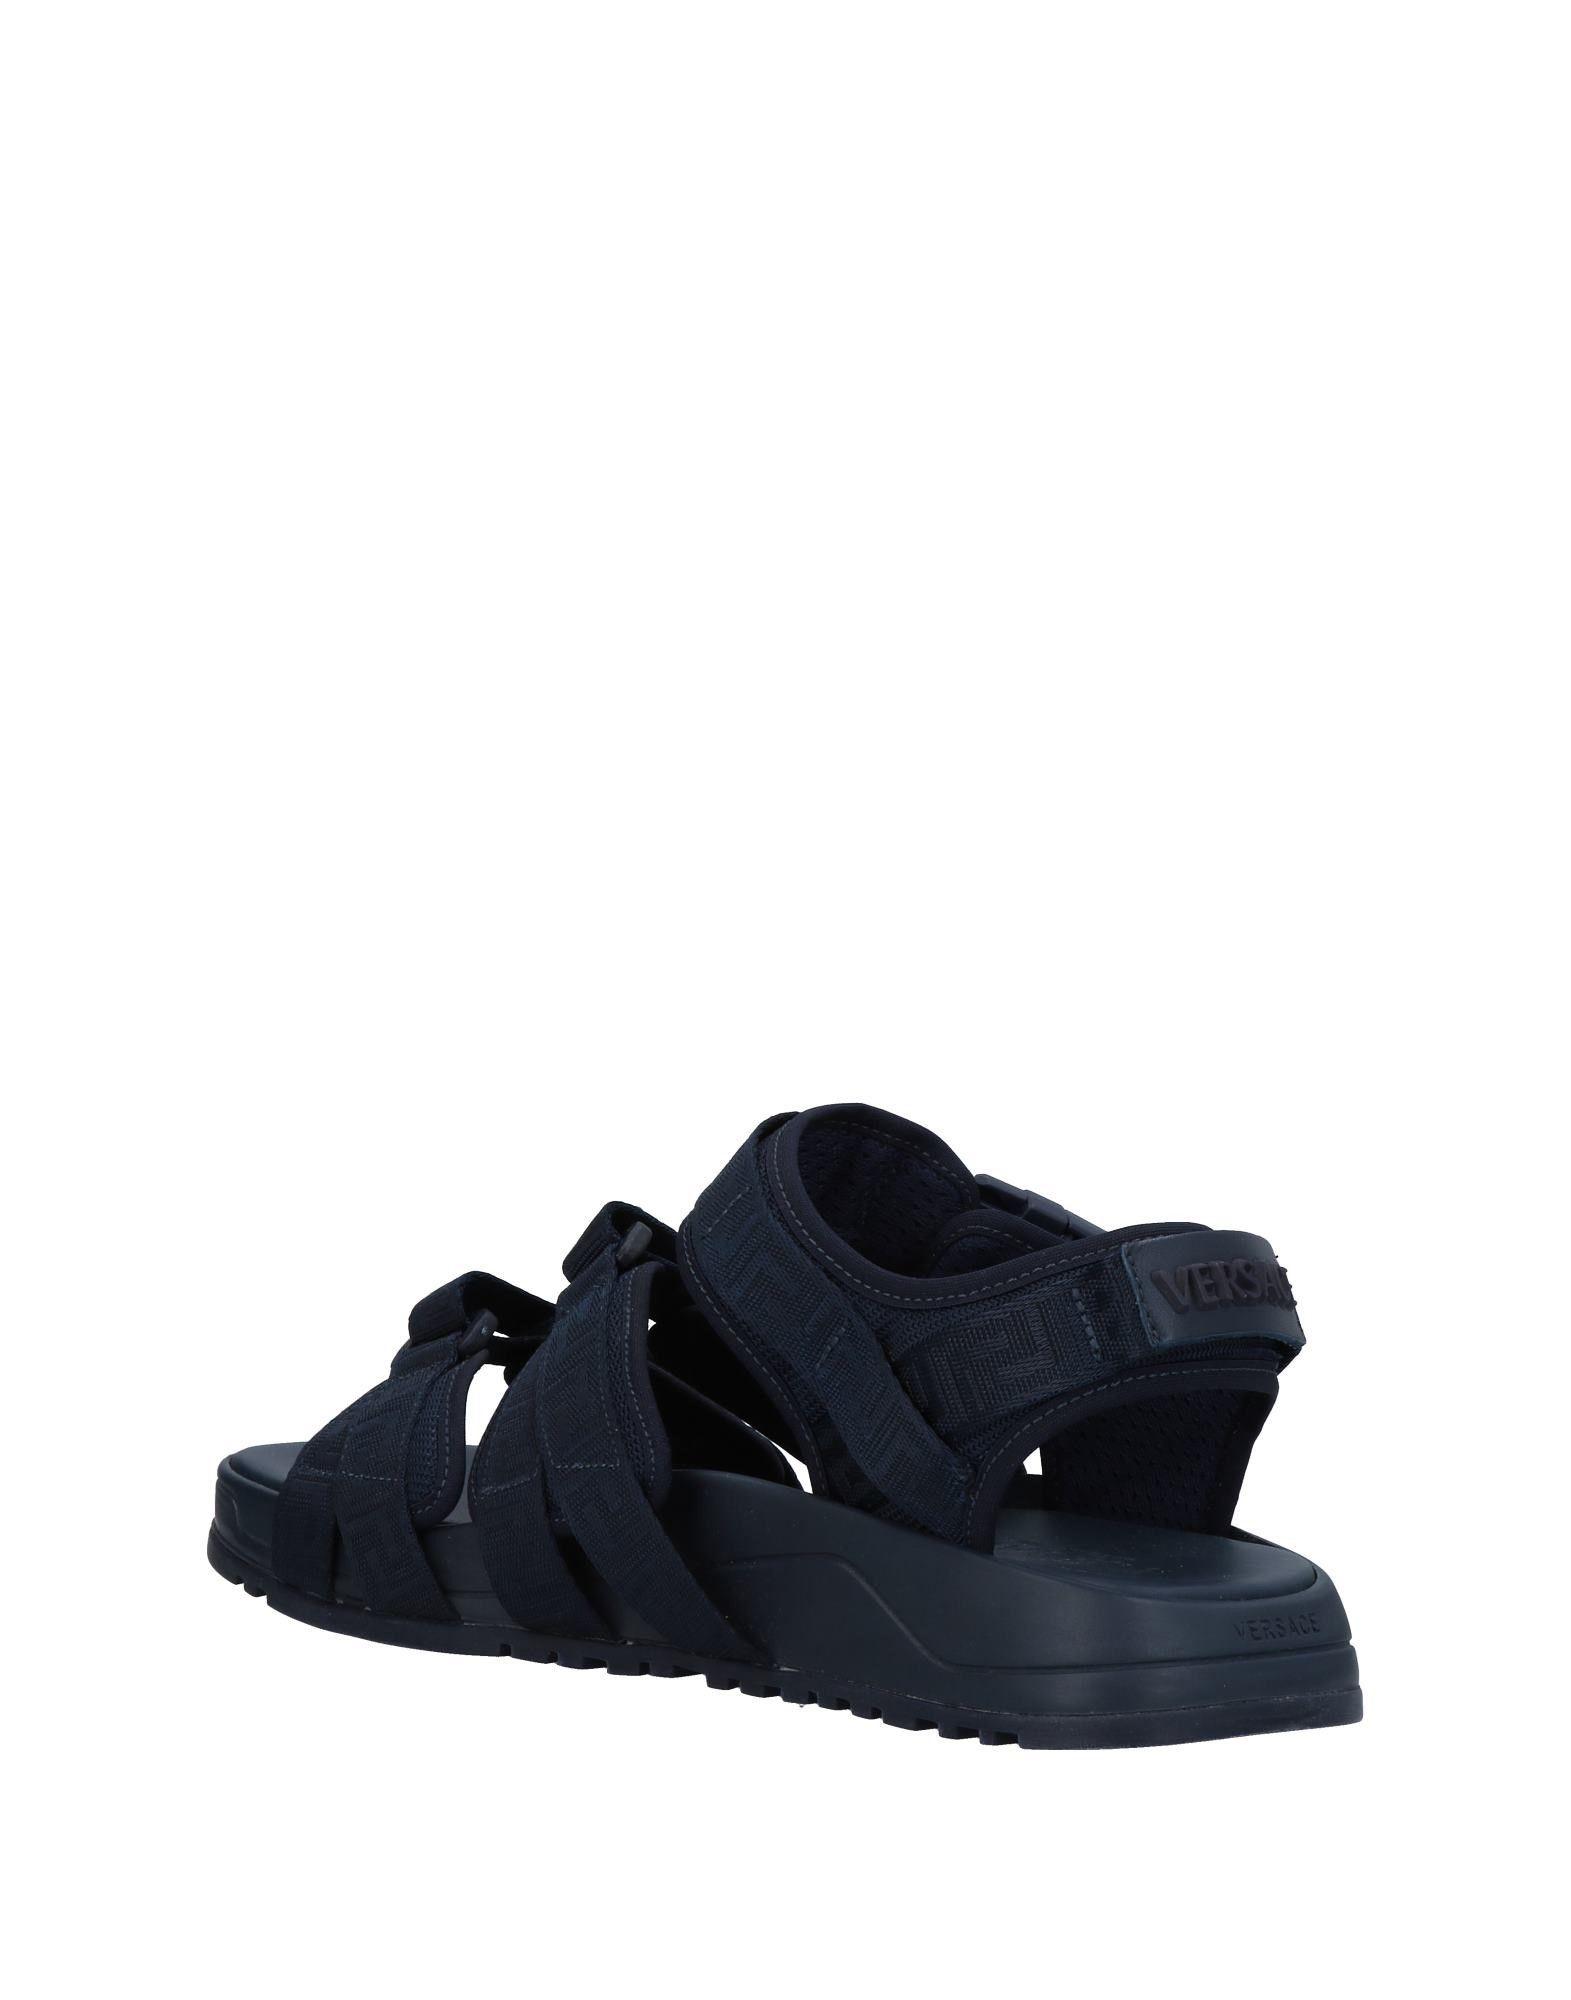 Sandales Versace Homme - Sandales Versace sur